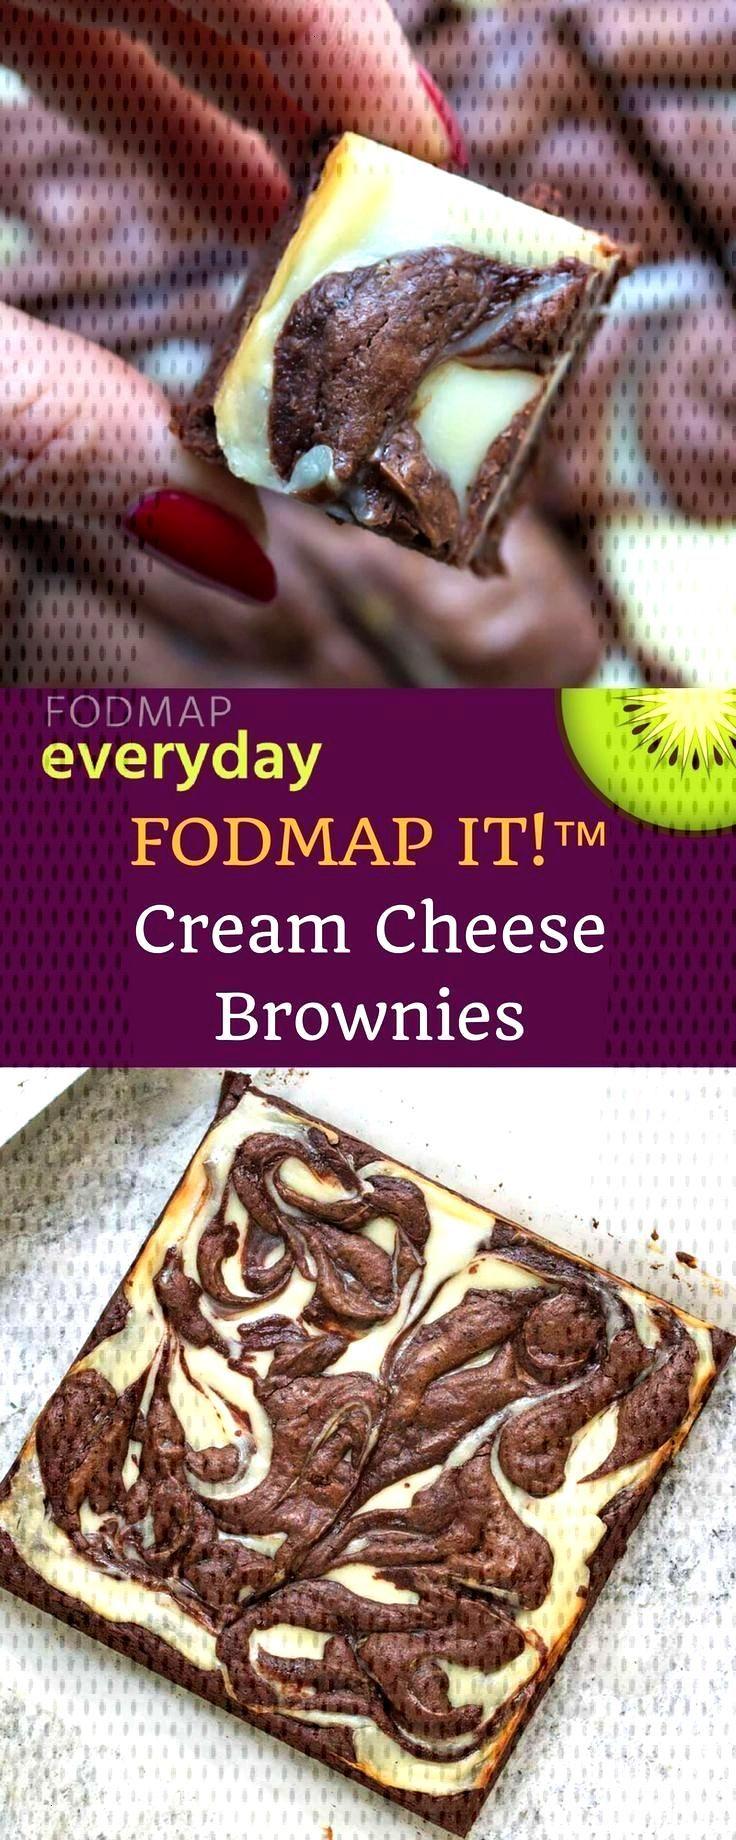 FODMAP IT! Cream Cheese Brownies - FODMAP Everyda /